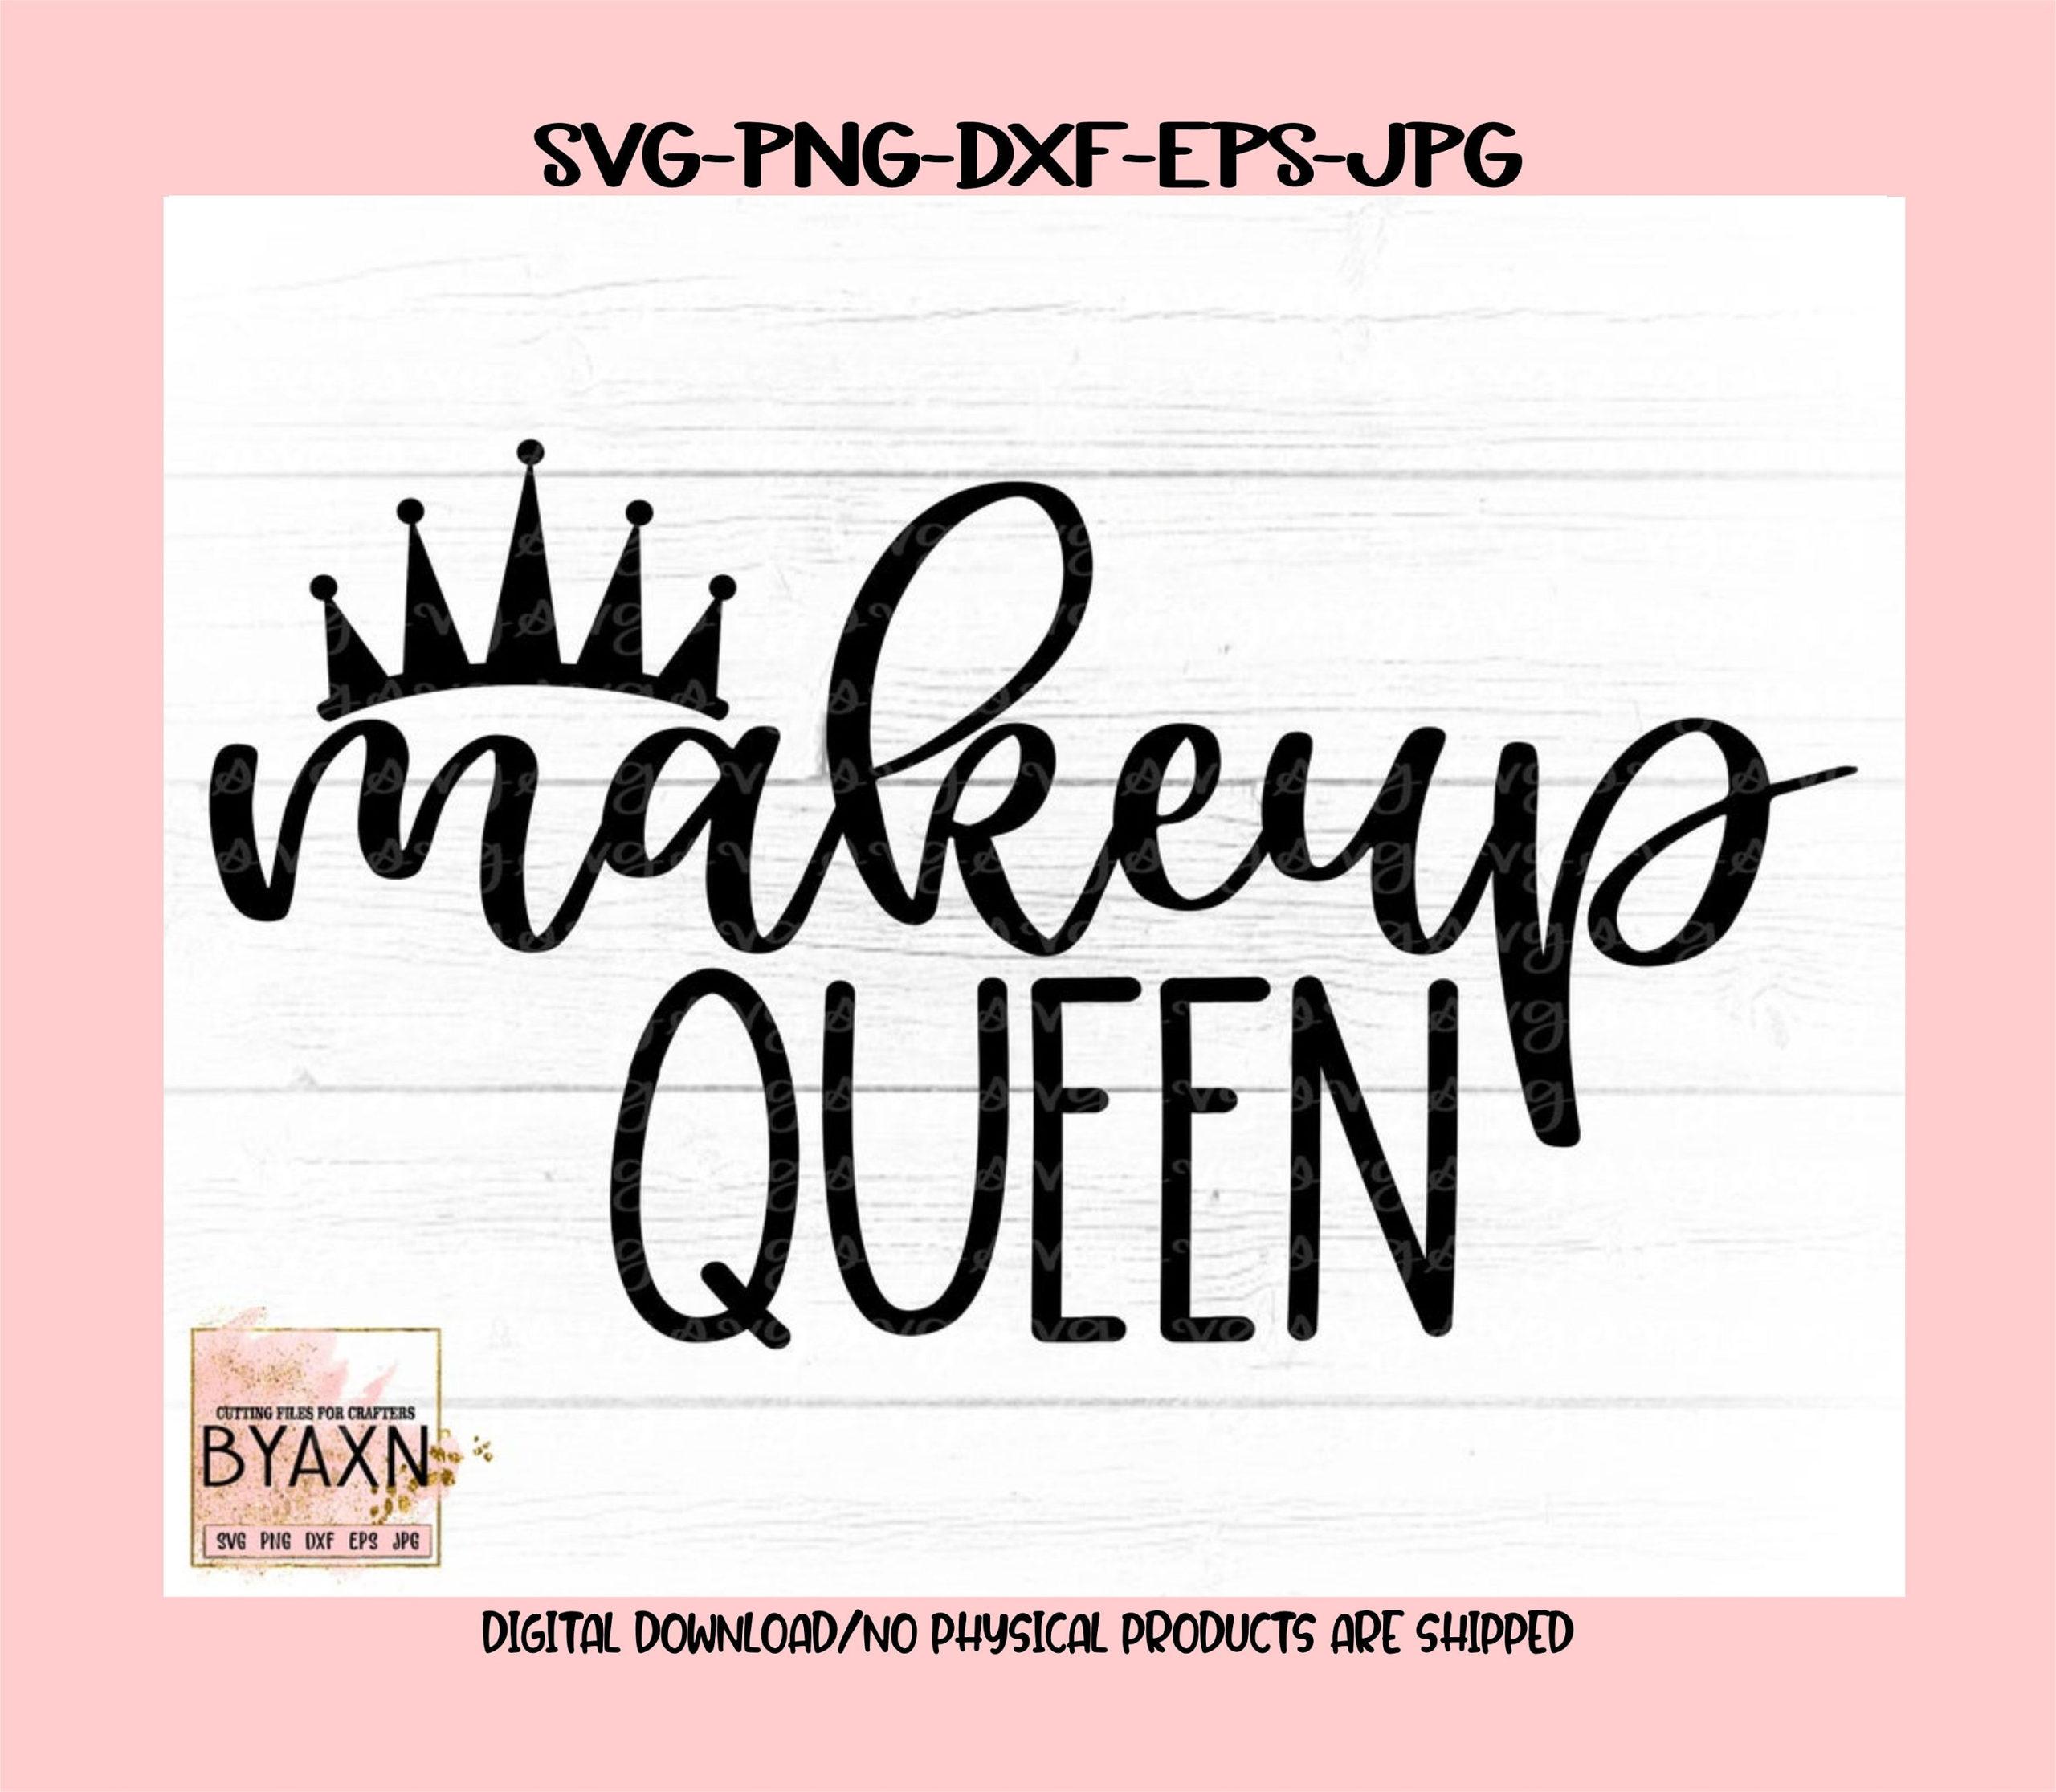 Makeup-svg-makeup-queen-svg-crown-svg-queen-svg-makeup-lover-svg-mascara-svg-makeup-svg-design-makeup-cut-file-cricut-svg-605148ef